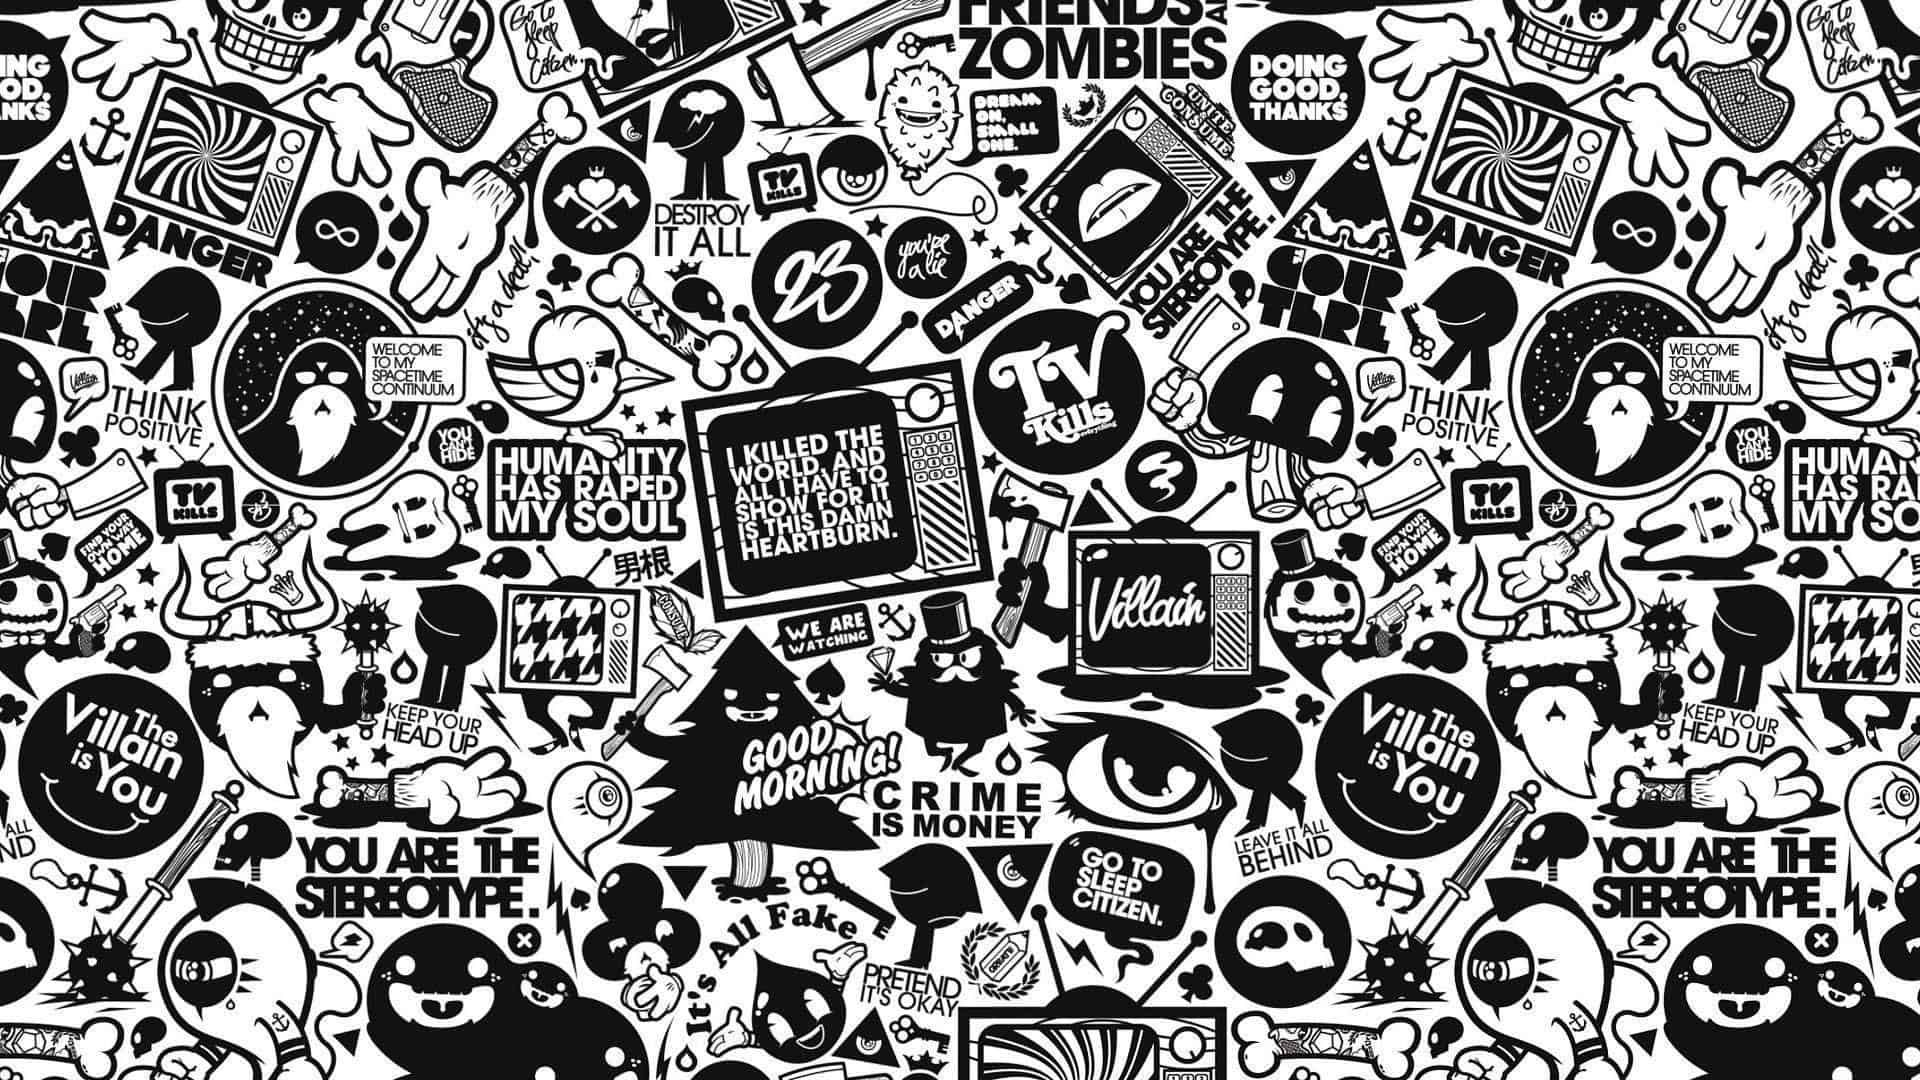 Cool Wallpapers For Mac Http Jazzwallpaper Com Cool Wallpapers For Mac Hd Wallpapers Mac Wallpaper Retro Wallpaper Cool Wallpapers For Mac